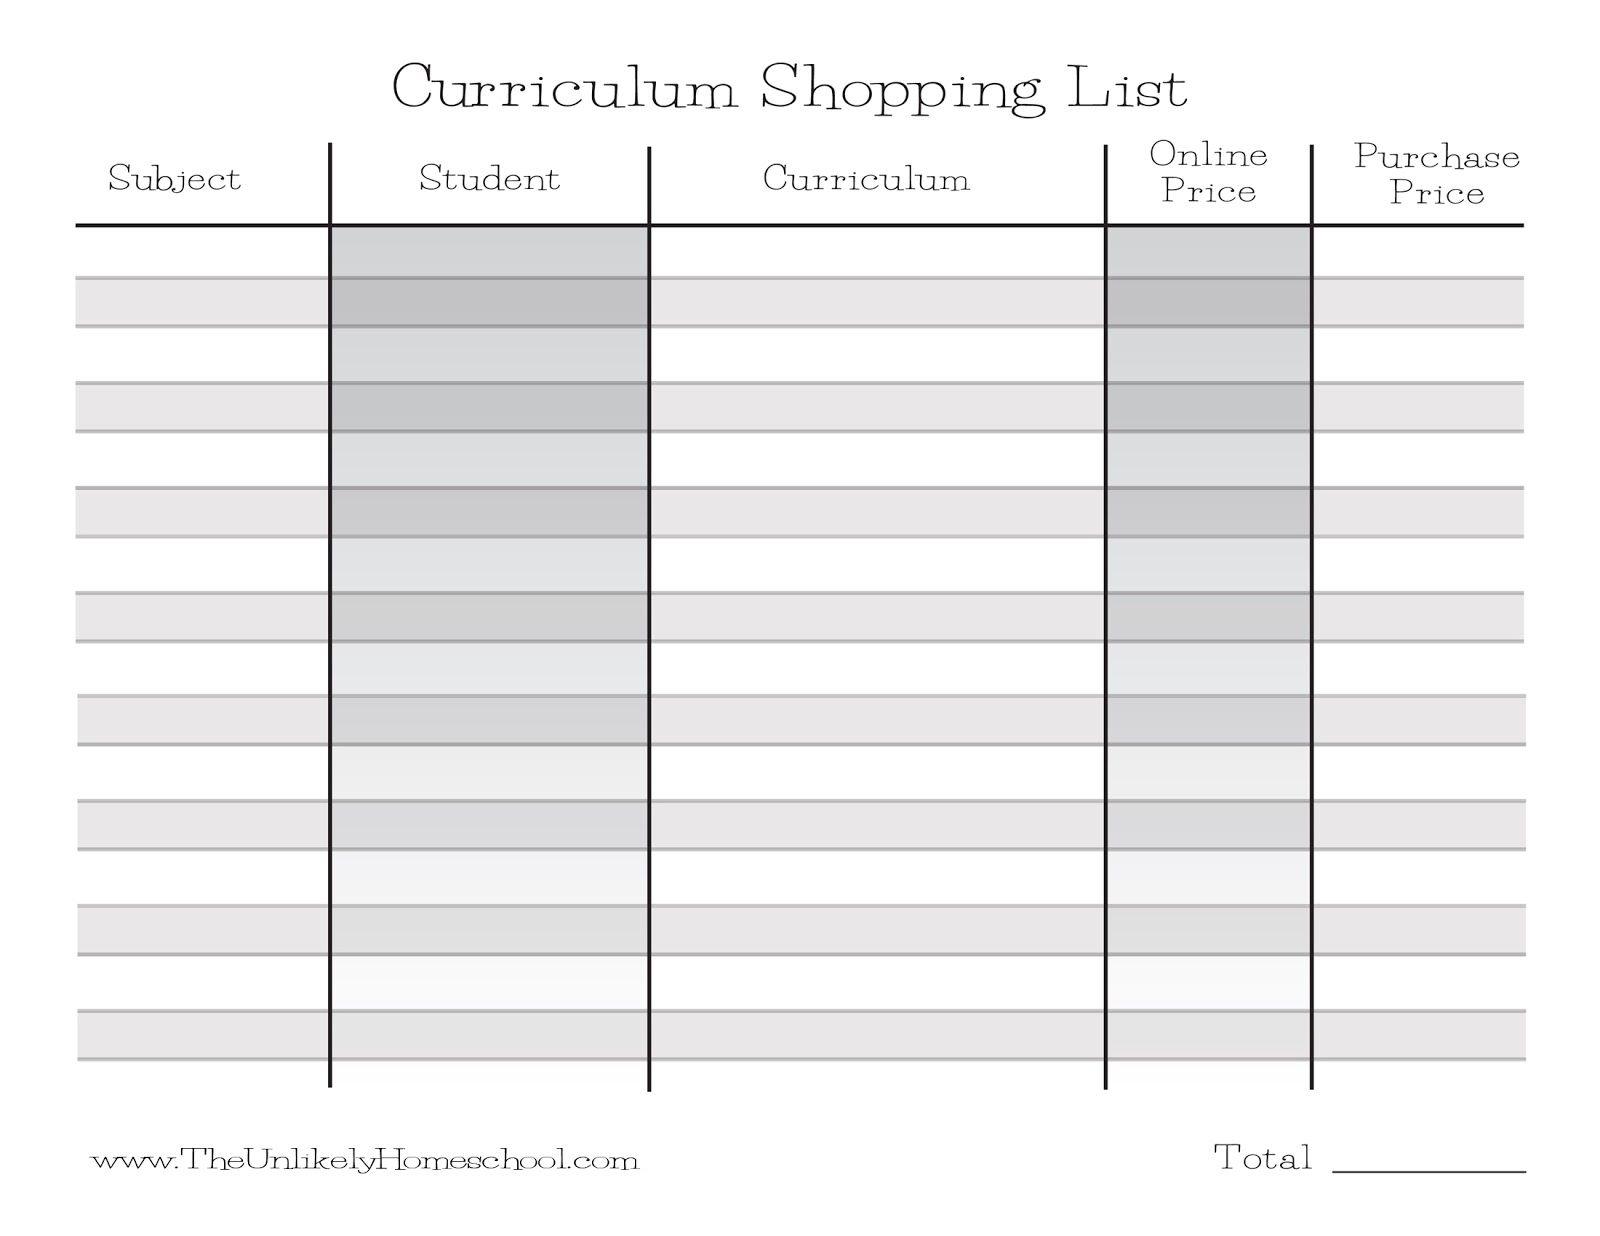 How I Plan My Homeschool Curriculum Shopping List With